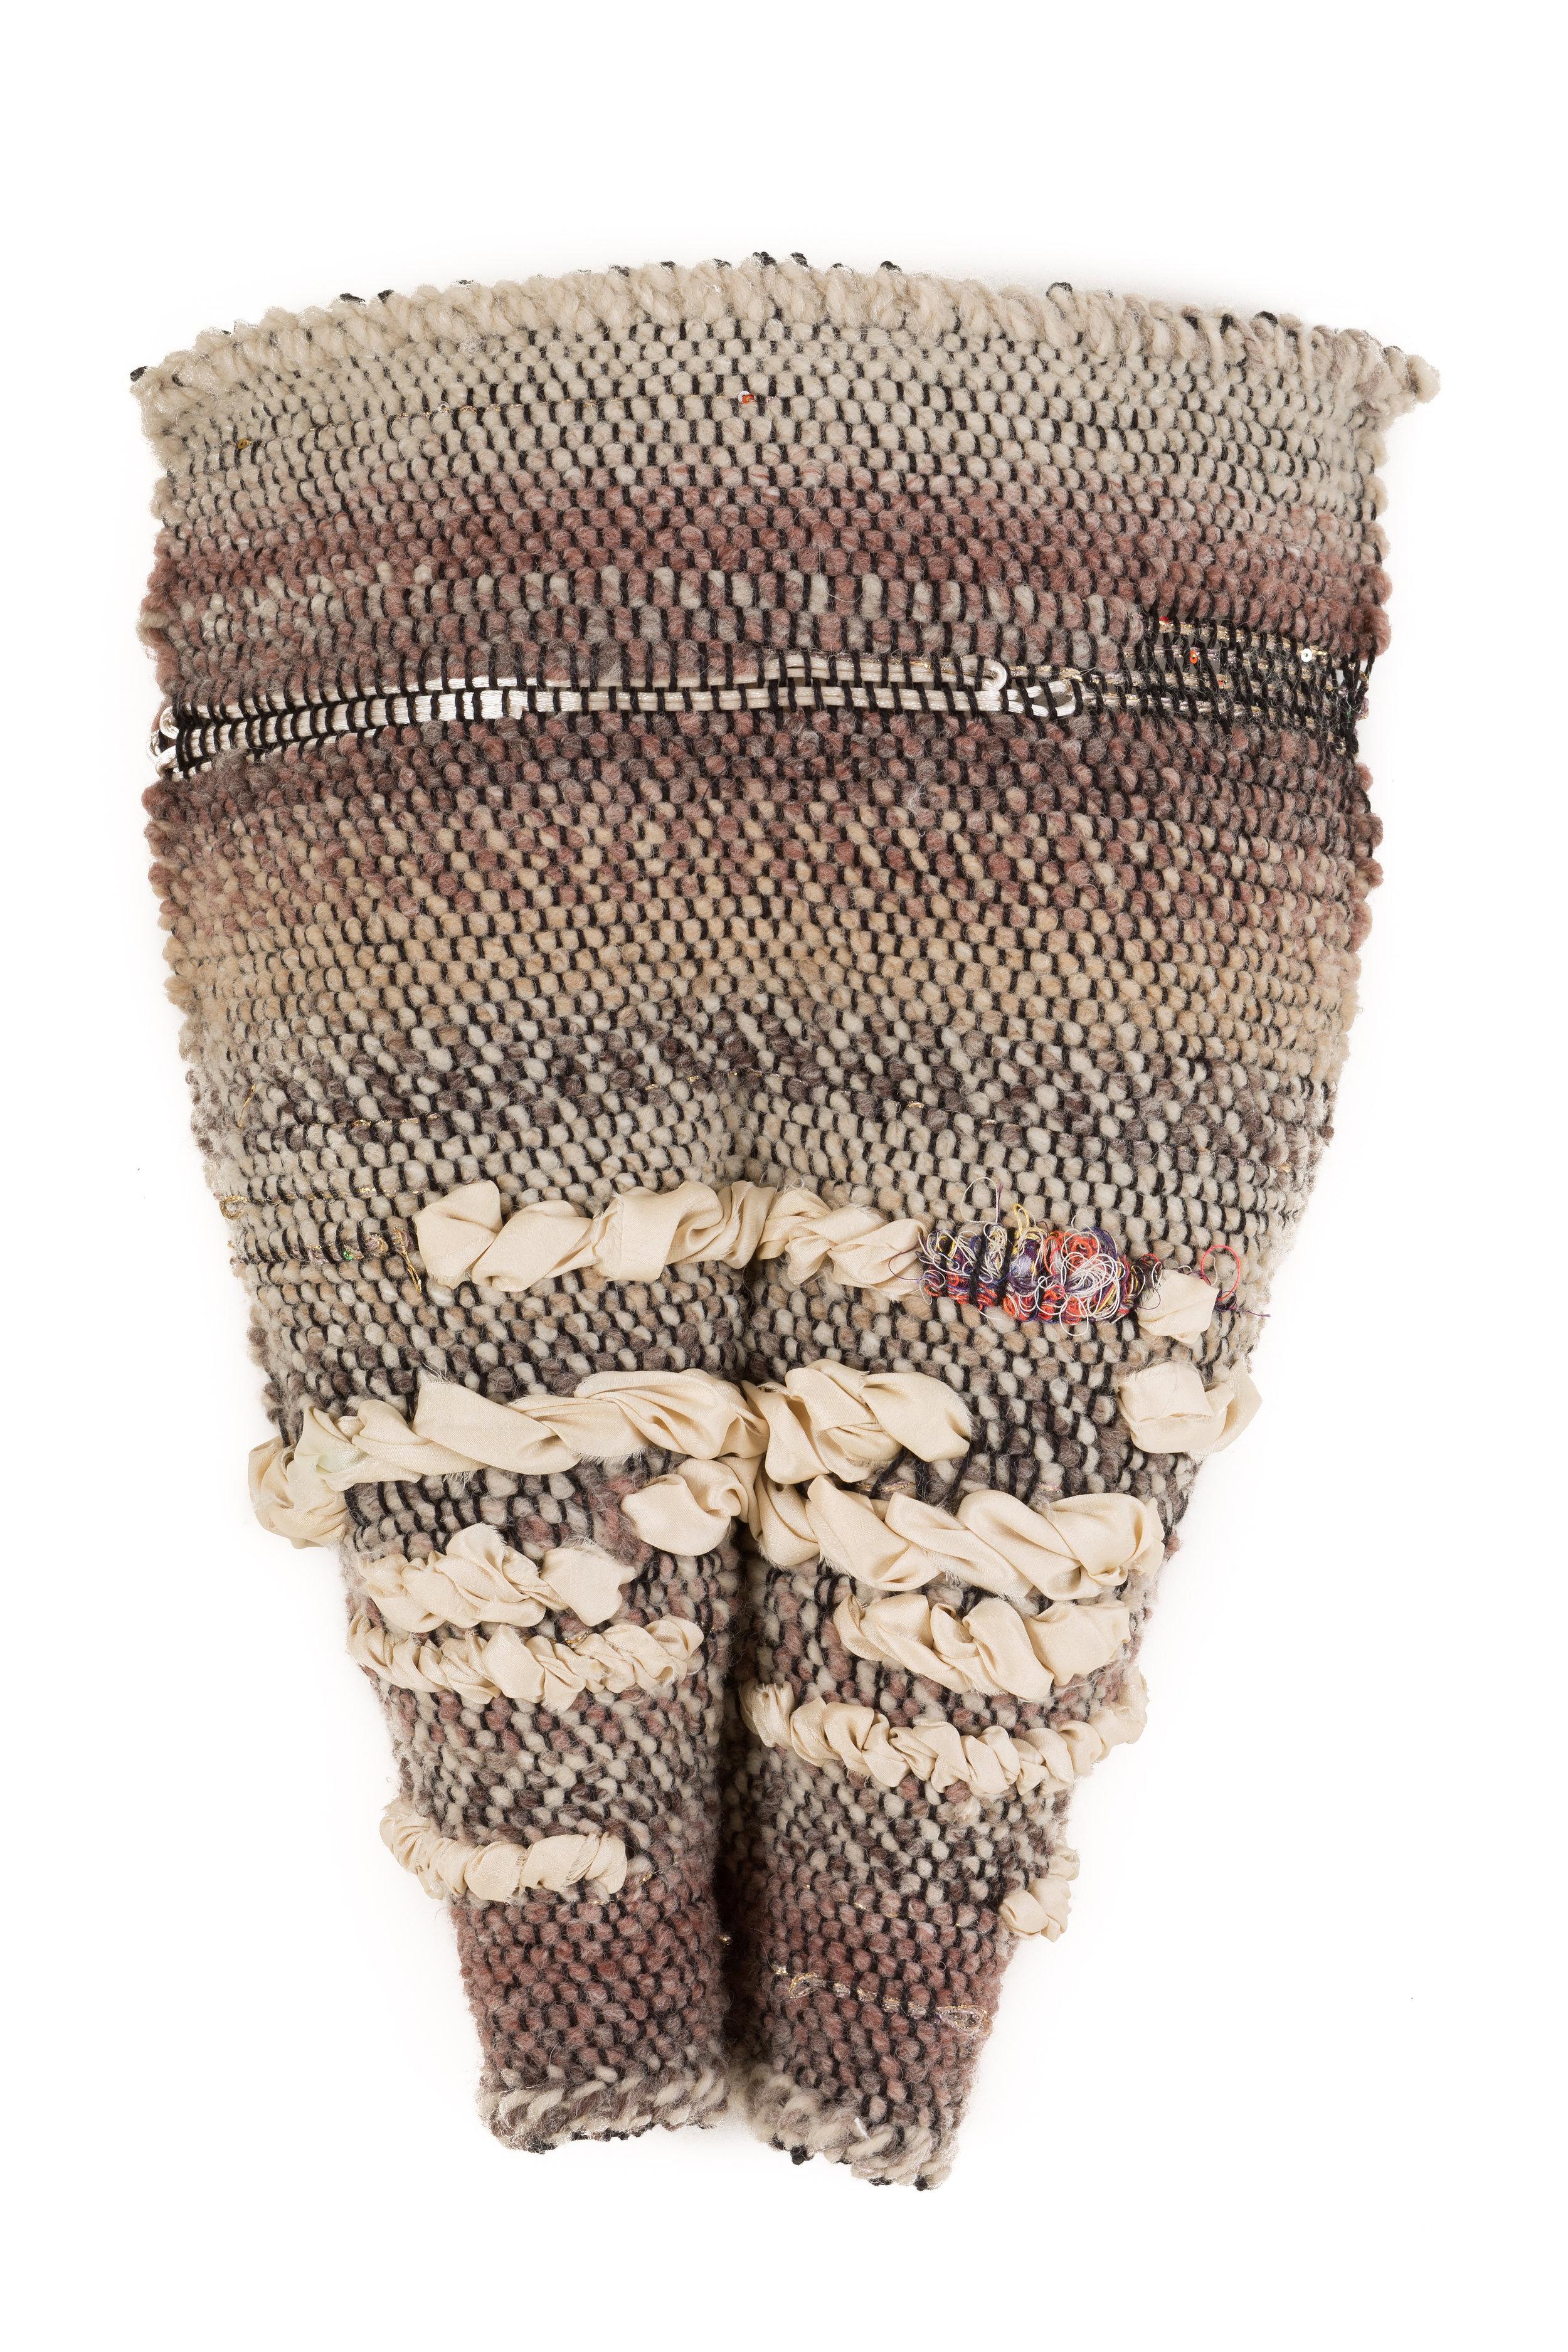 Sylvia Vander Sluis,  Contentment (Pelvis series)  Handwoven yarn and silk, 19x12x4